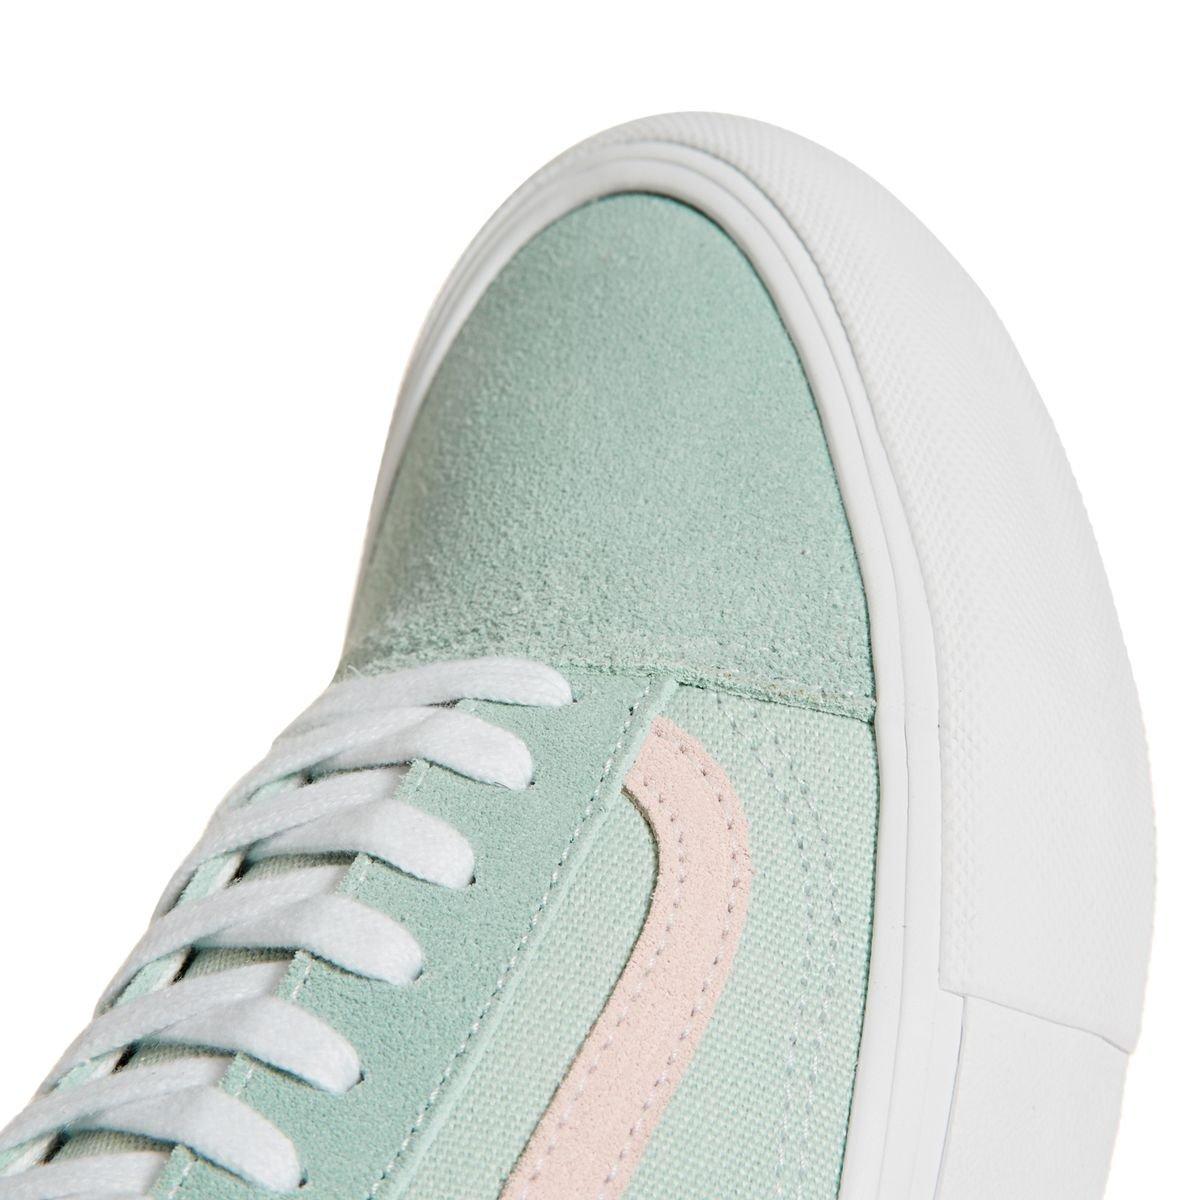 2e9c0717485d65 Vans Old Skool Pro Sneakers (Danlu Harbor Gray Pearl) Skate Suede Vulc Shoes   Amazon.ca  Shoes   Handbags